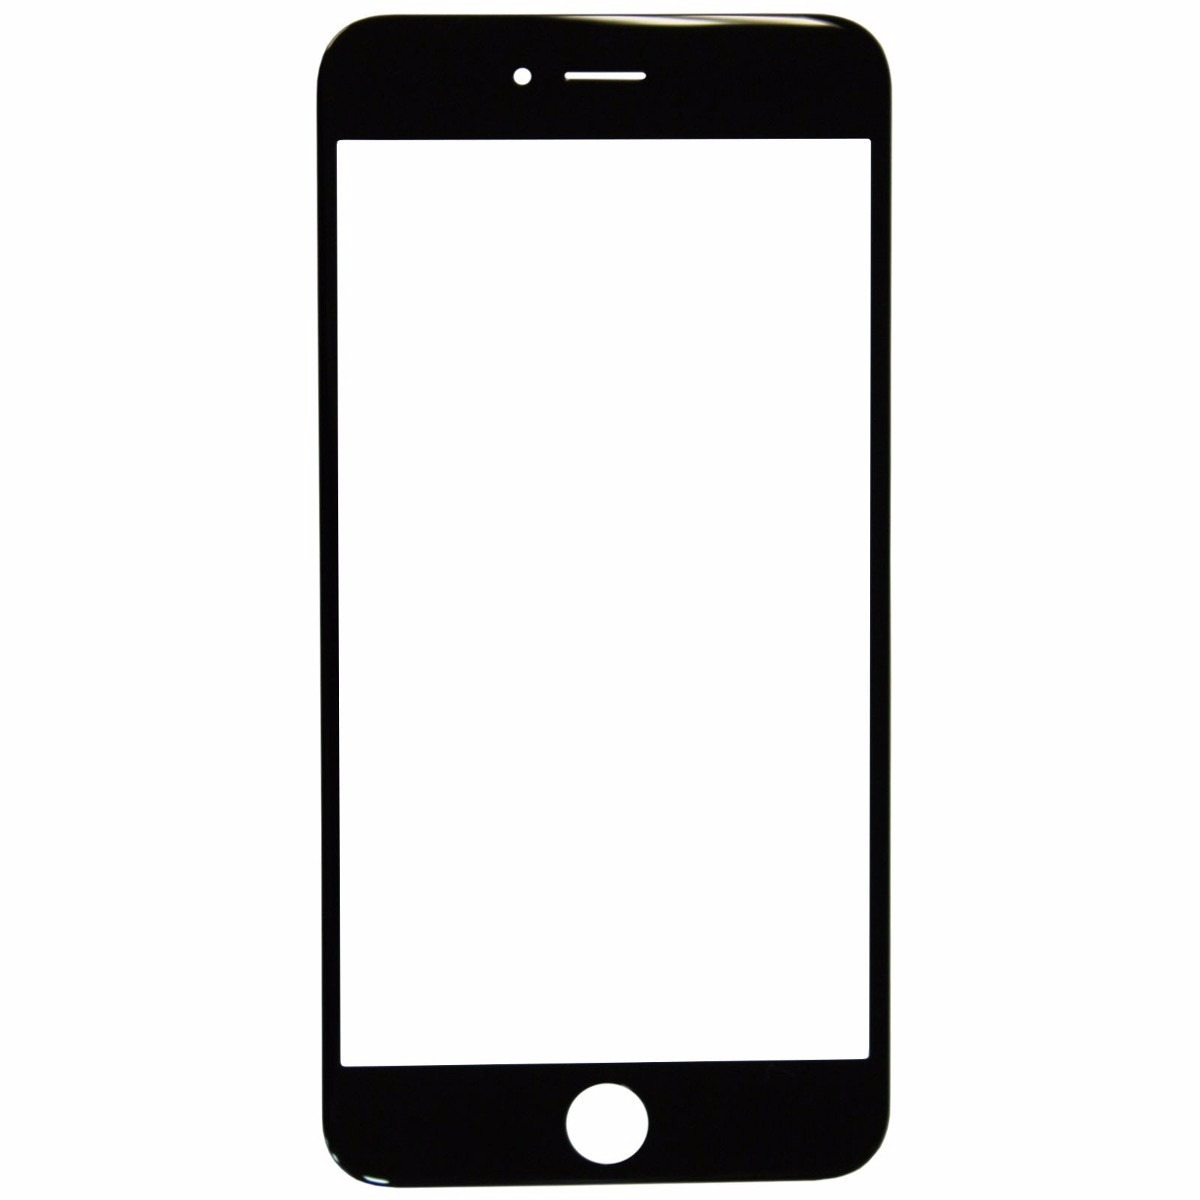 Vidro Tela Visor Original Apple Iphone 6 Plus 5 5 Preto